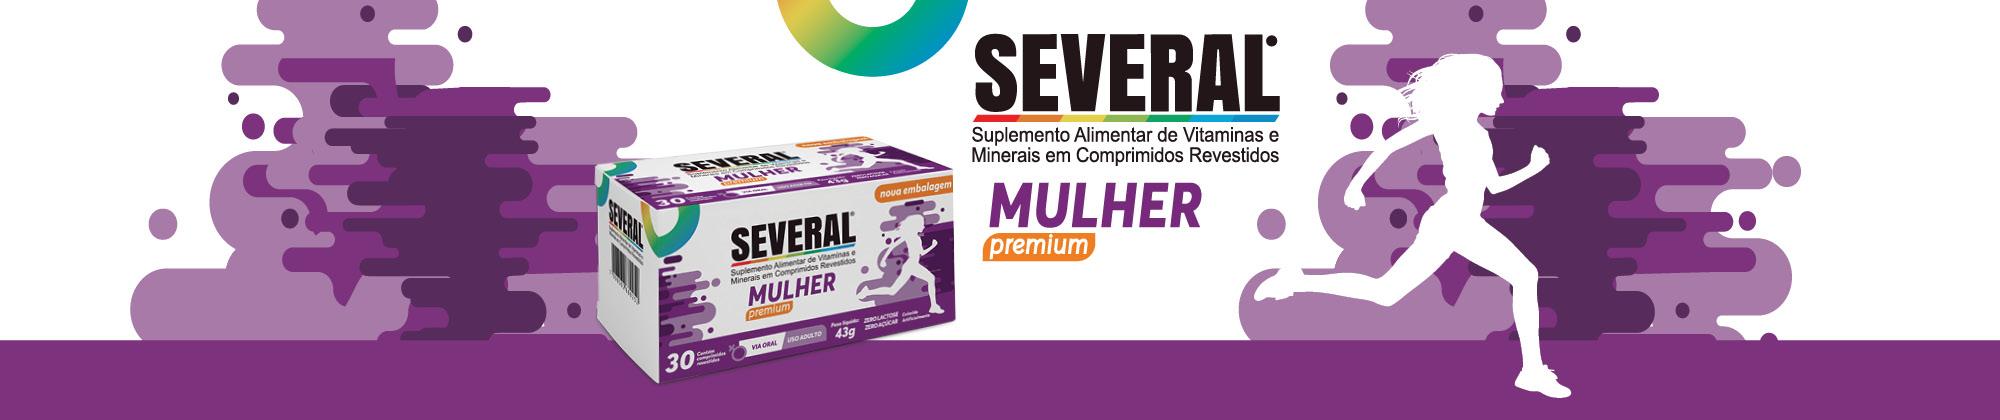 Suplemento Several Mulher Premium